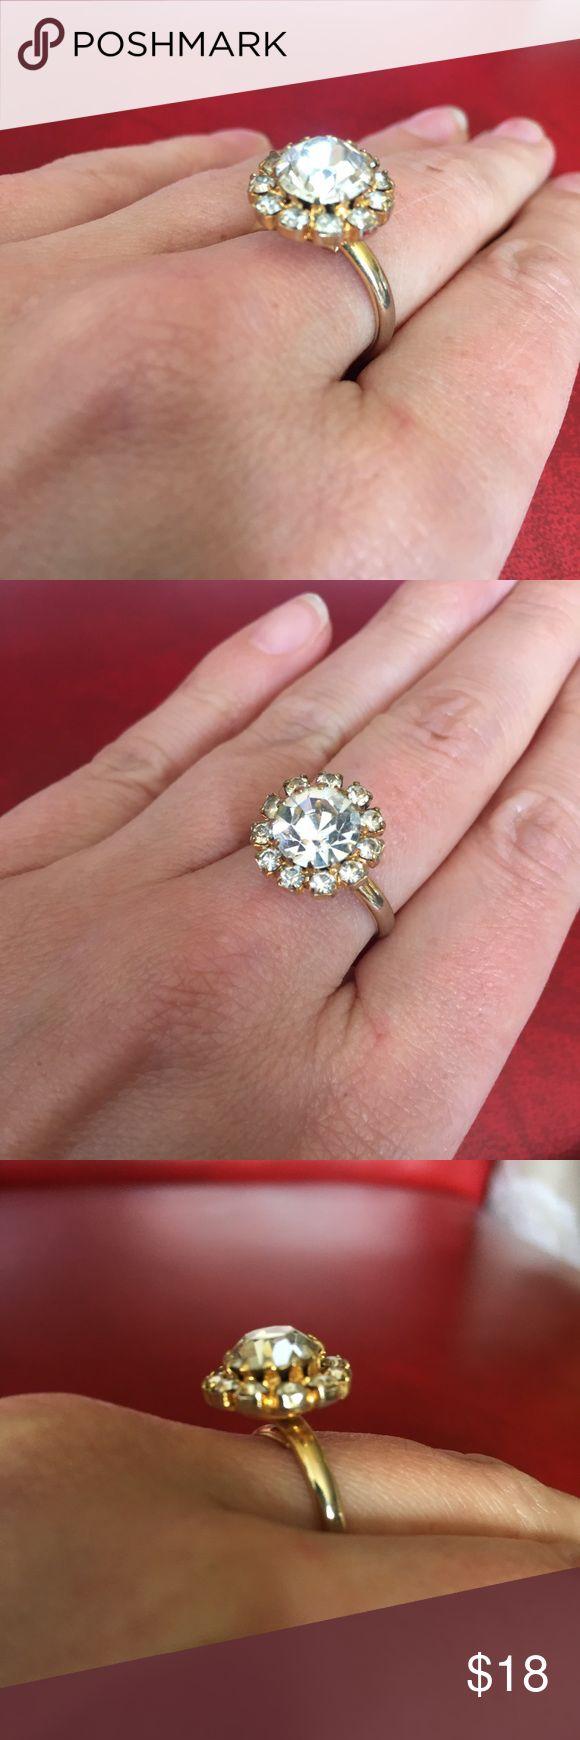 5847 best <<Engagement World>> images on Pinterest | Adventure ...